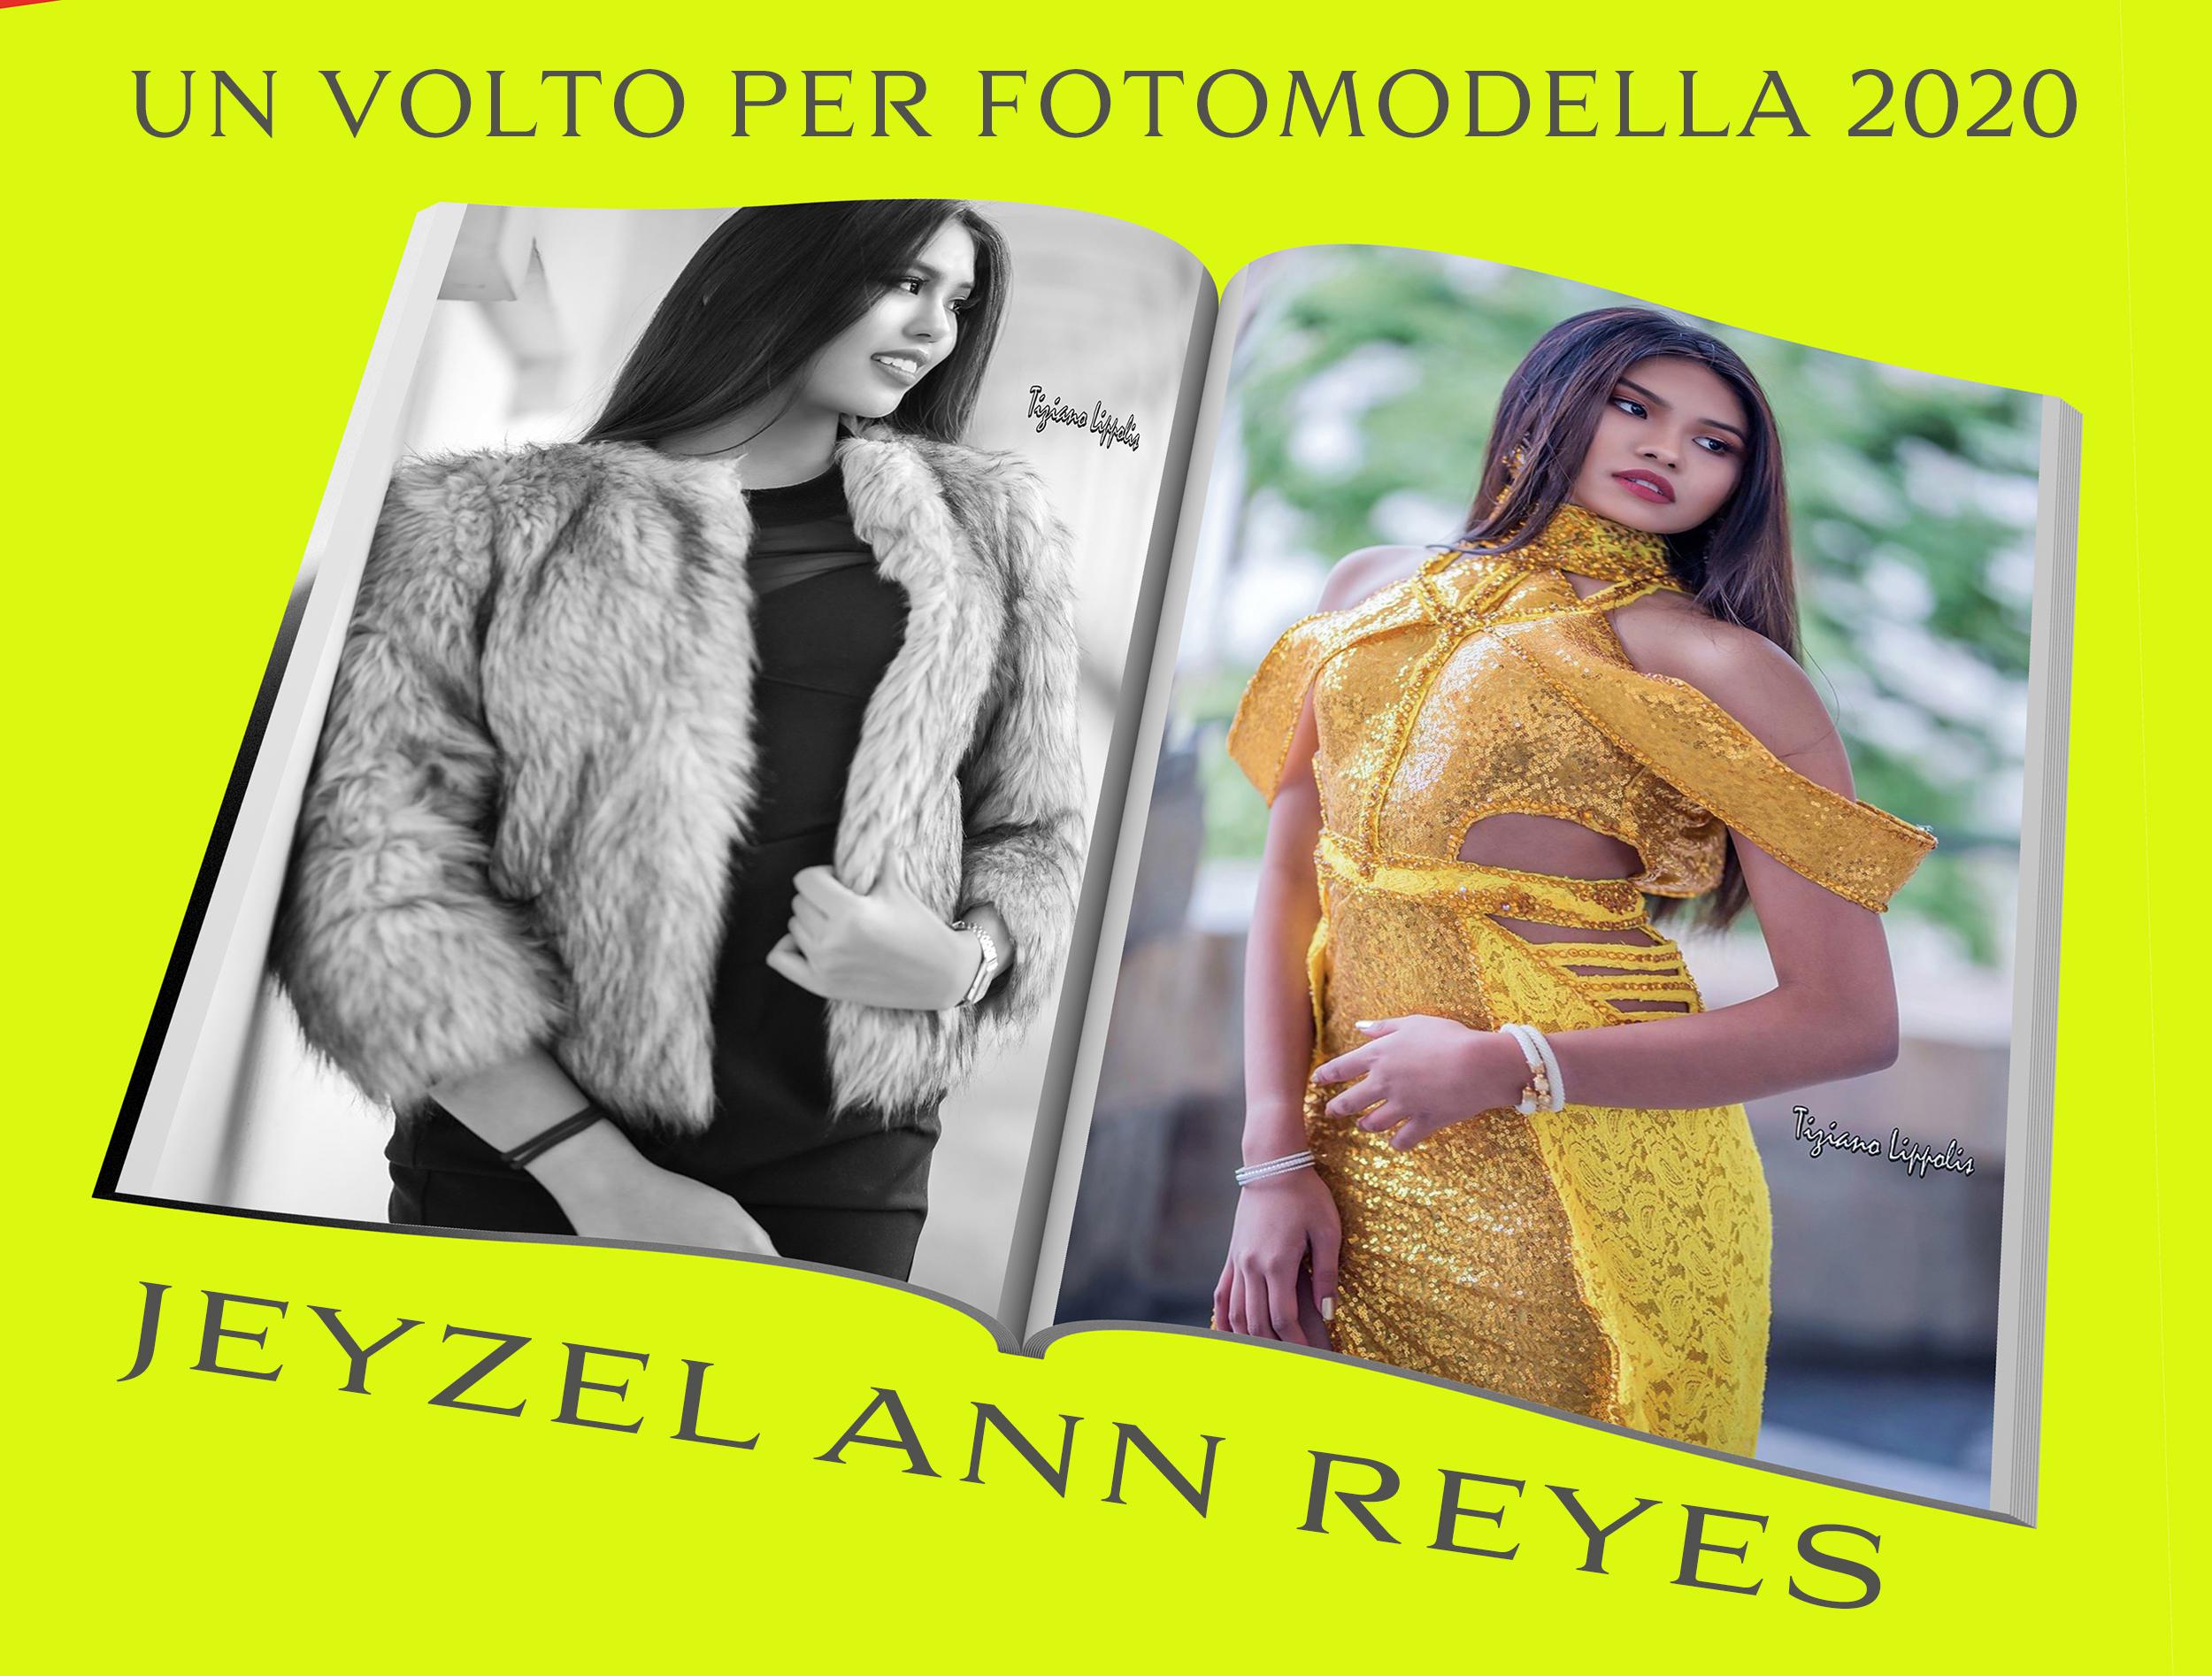 Jeyzel Ann Reyes